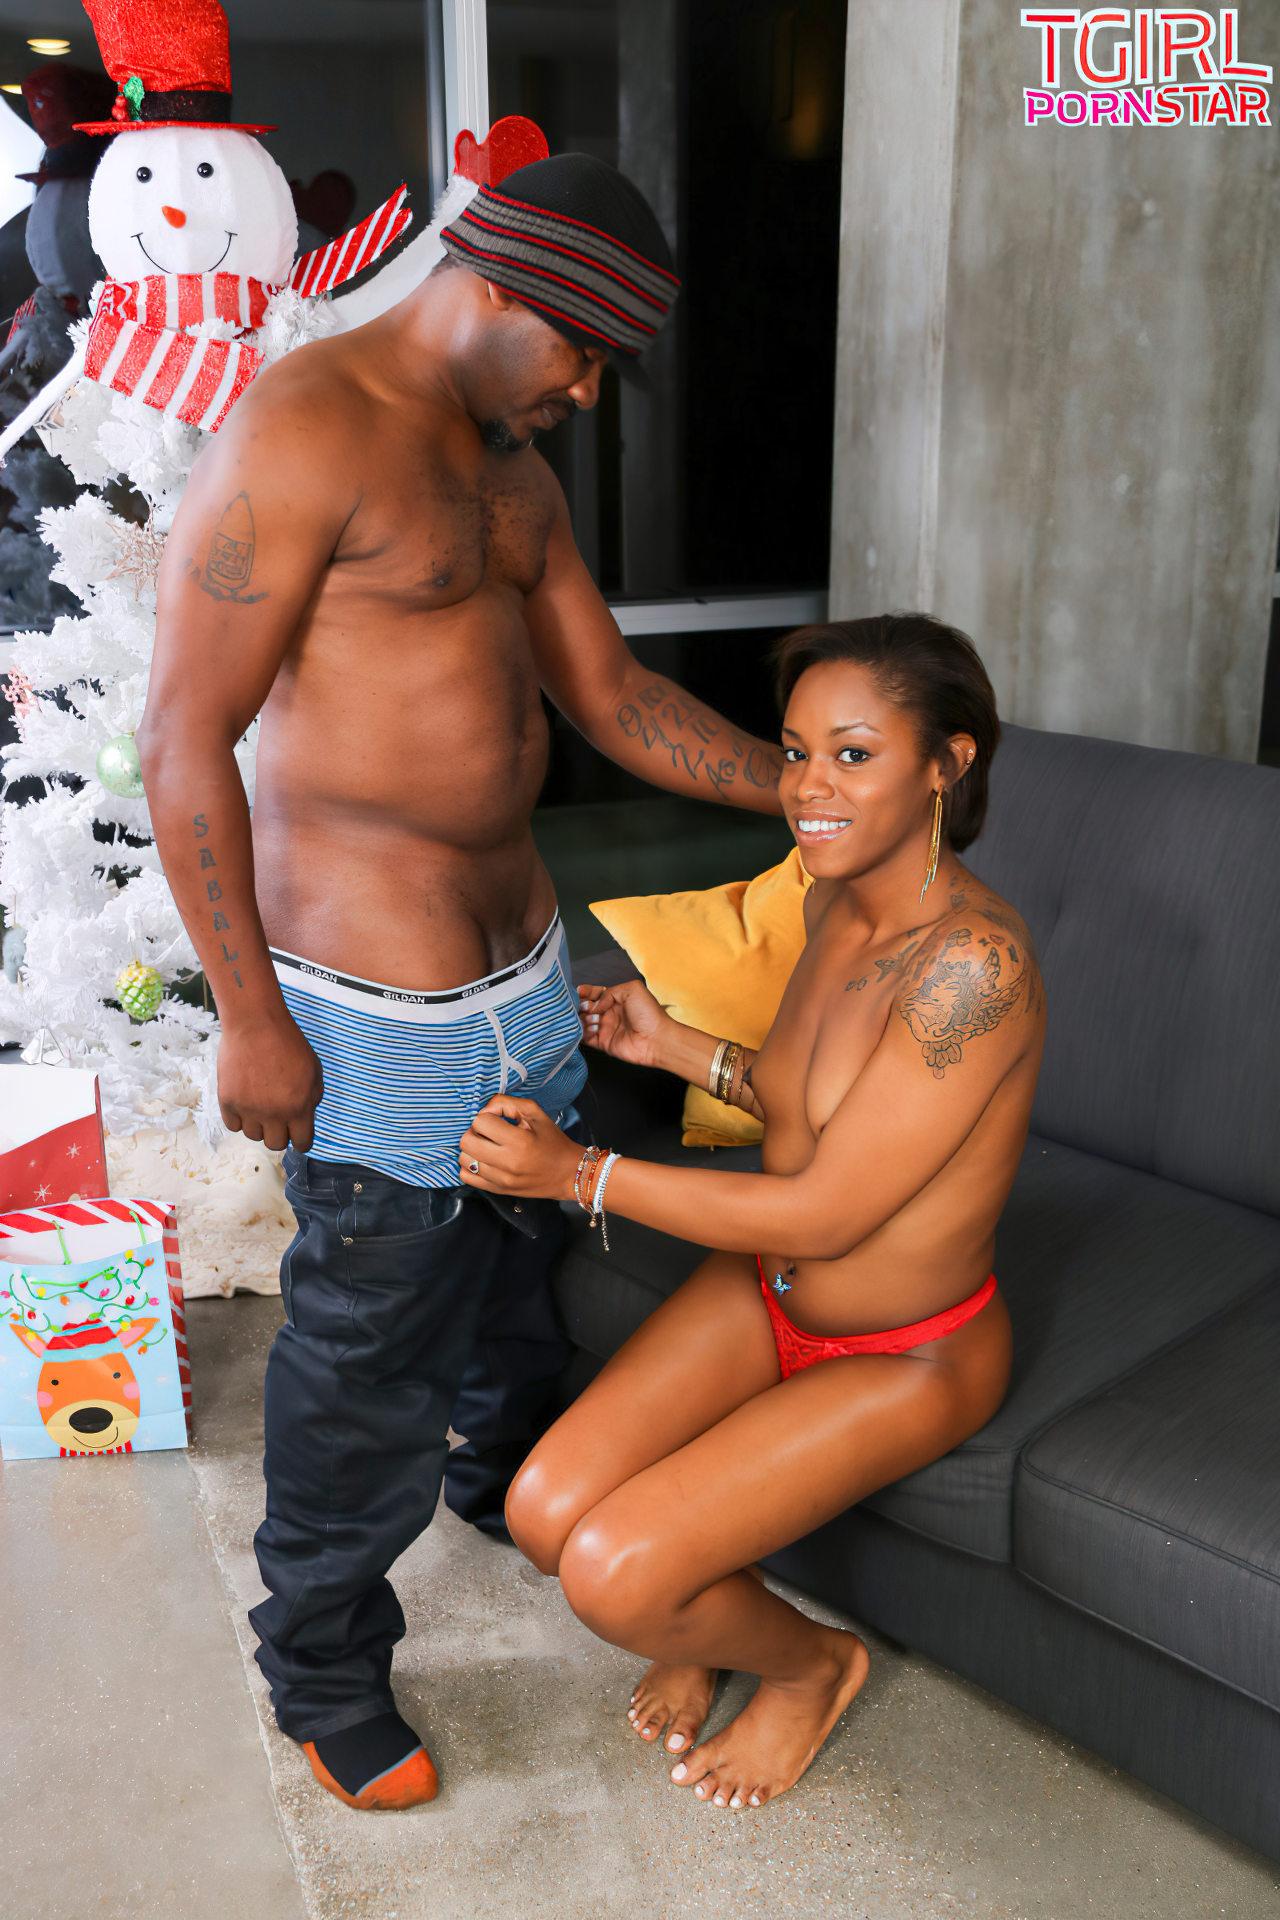 Travesti Negra Fodida no Natal (4)